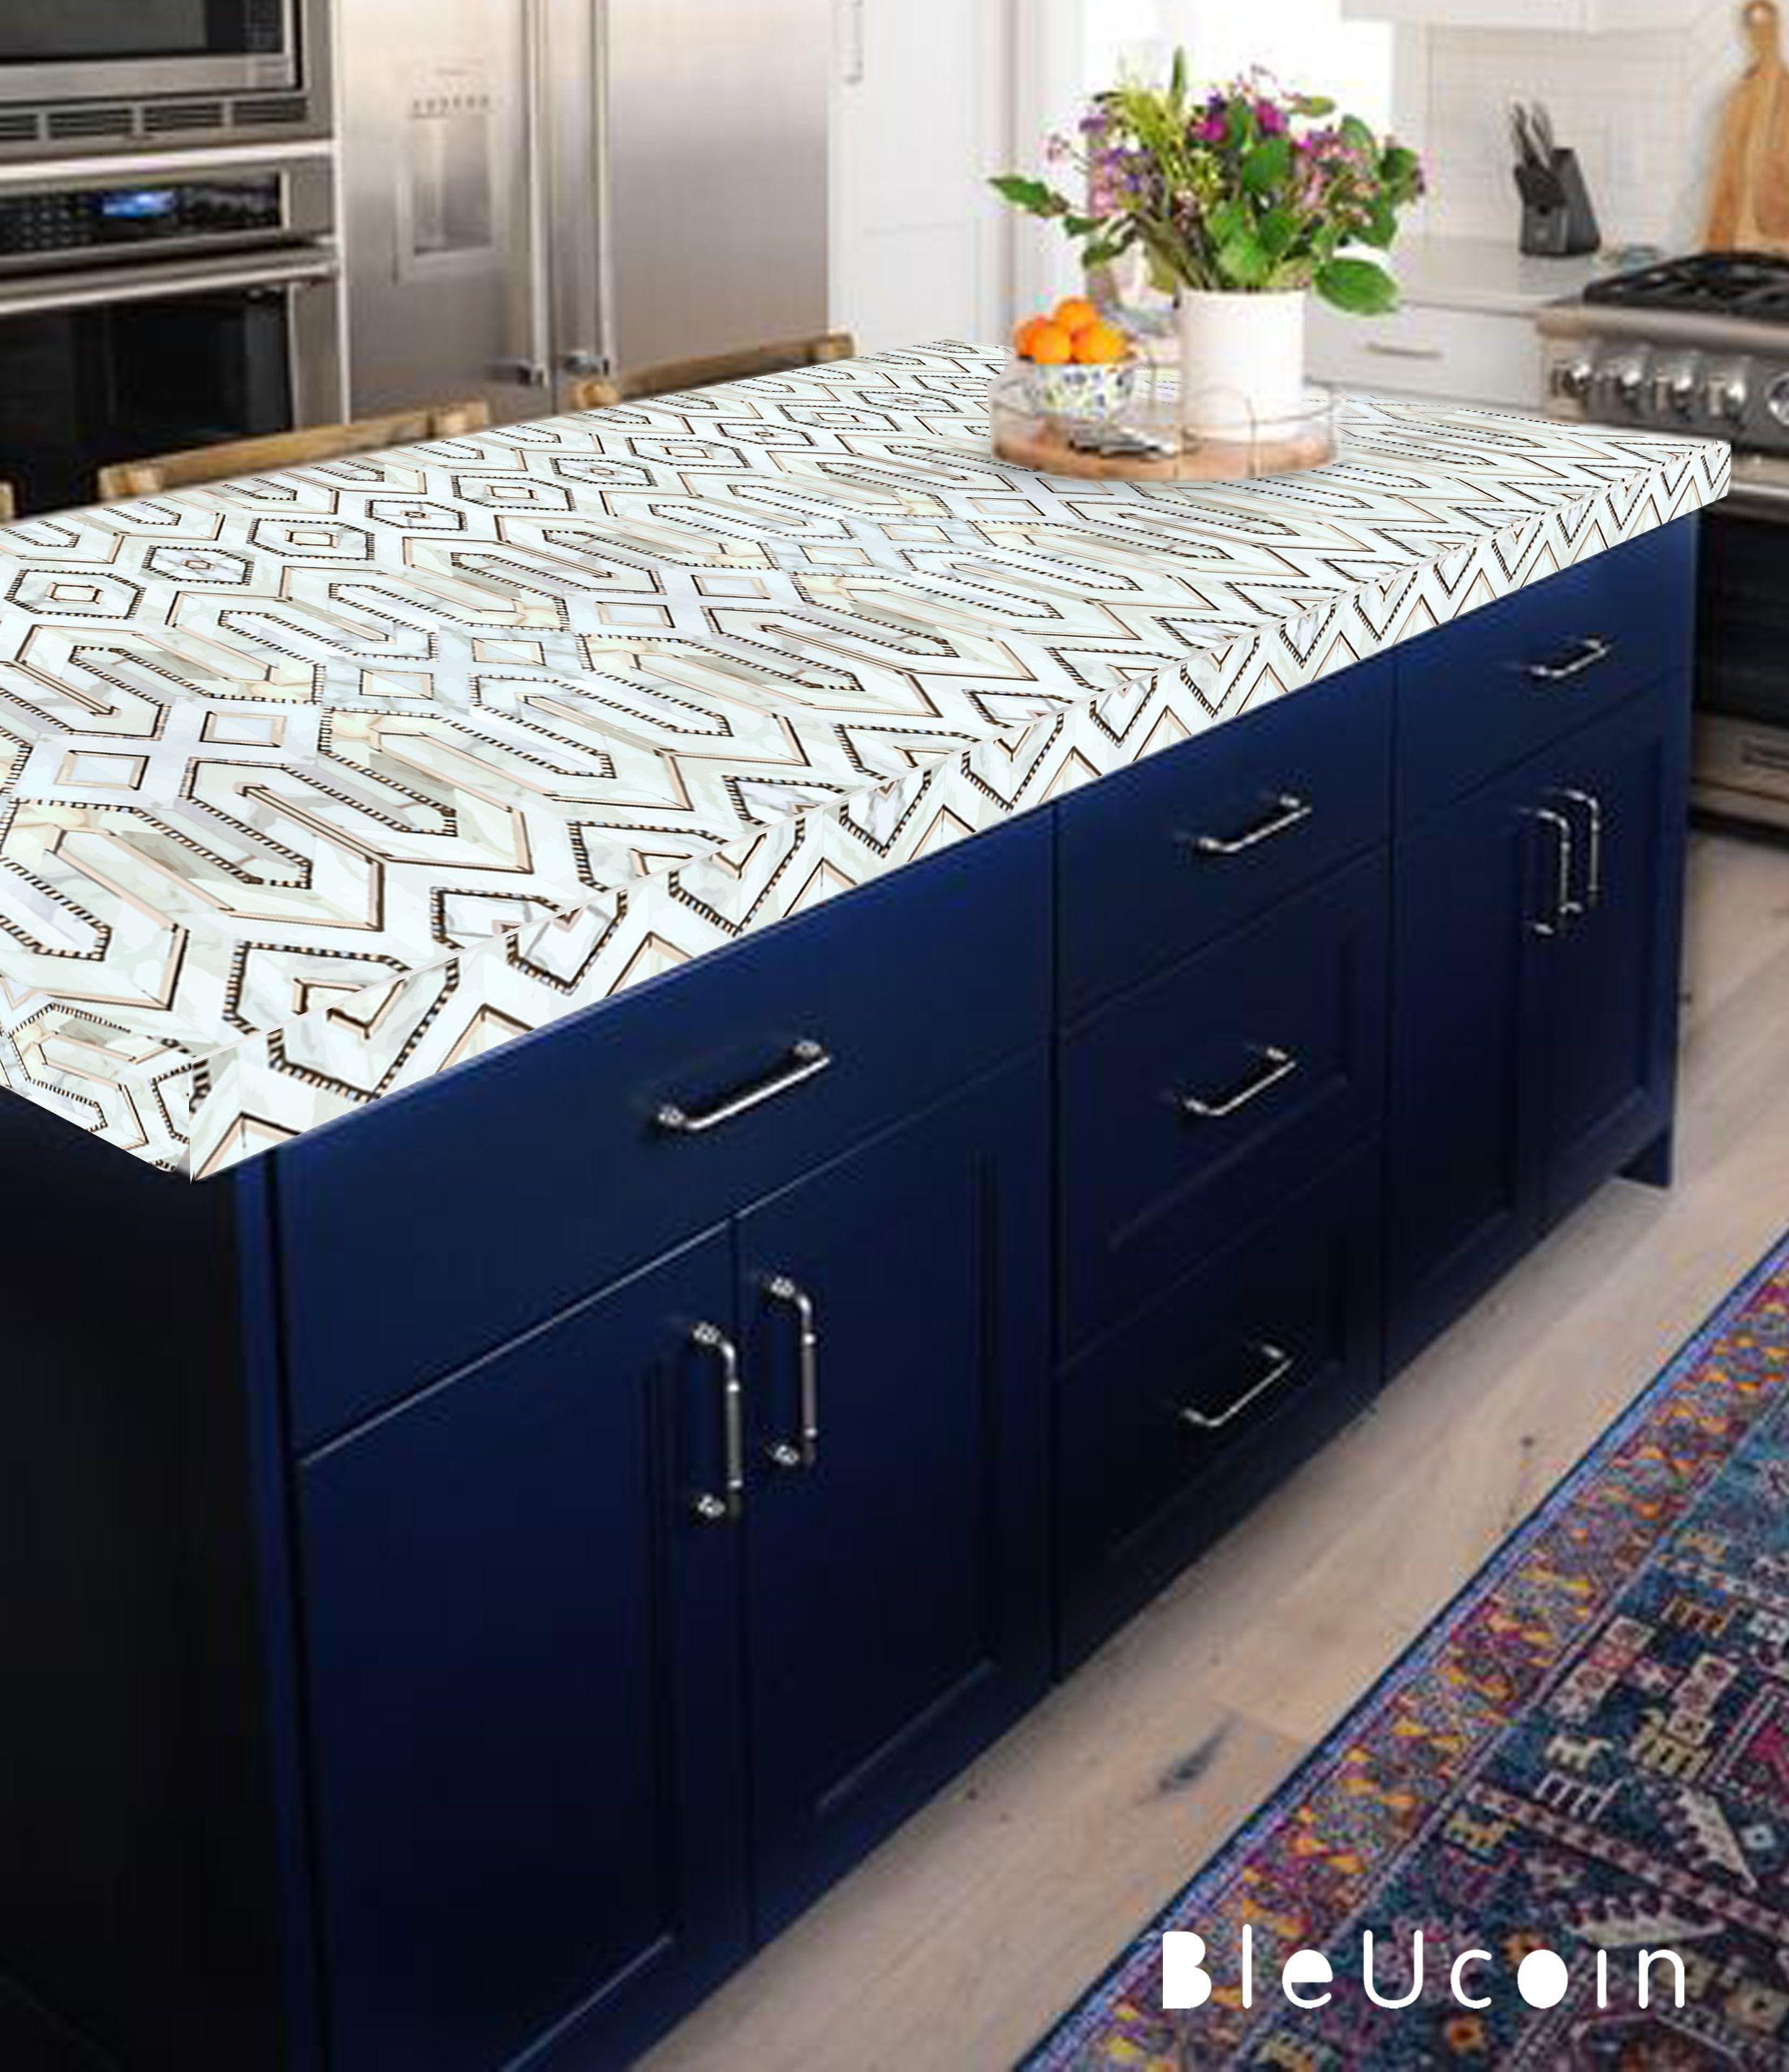 Bristol Kitchen Countertop Vinyl Panel Removable Peel Stick Etsy Kitchen Backsplash Trends Kitchen Cabinets Kitchen Trends